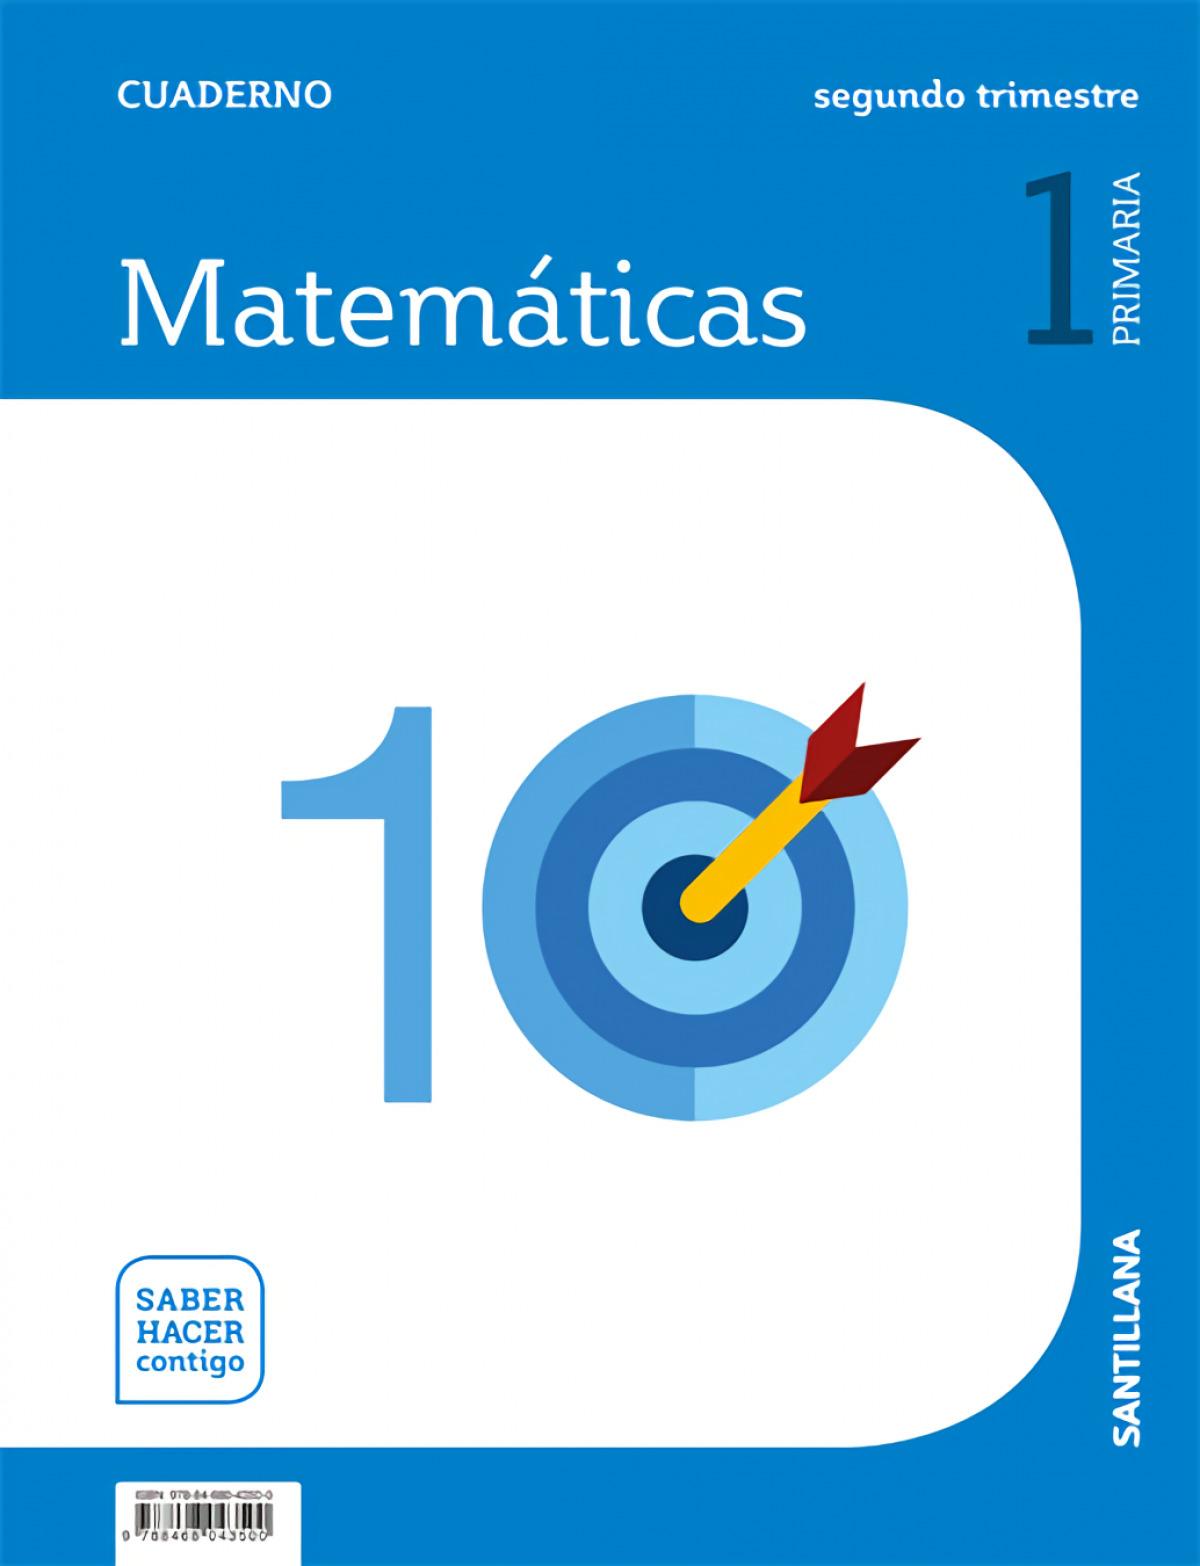 CUADERNO MATEMÁTICAS 2-1o.PRIMARIA. SABER HACER CONTIGO 9788468043500